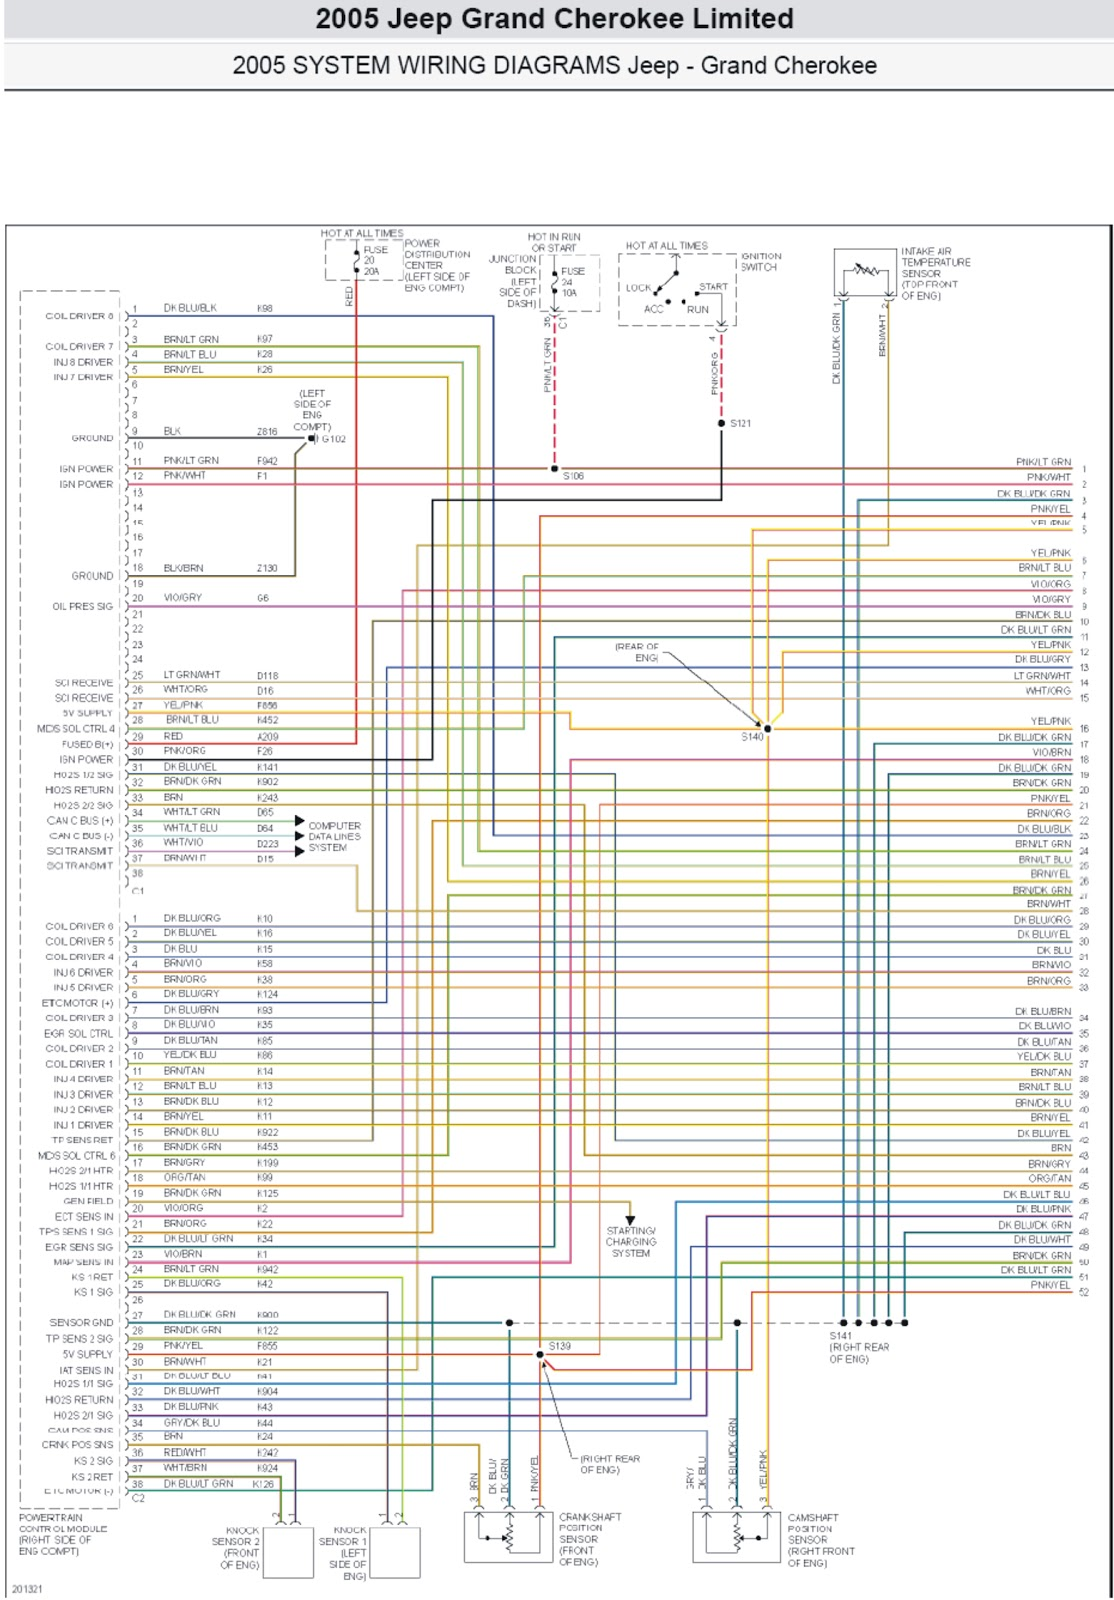 hight resolution of 2005 grand cherokee wiring diagram wiring diagrams wni jeep grand cherokee wiring diagram 2014 jeep grand cherokee wiring